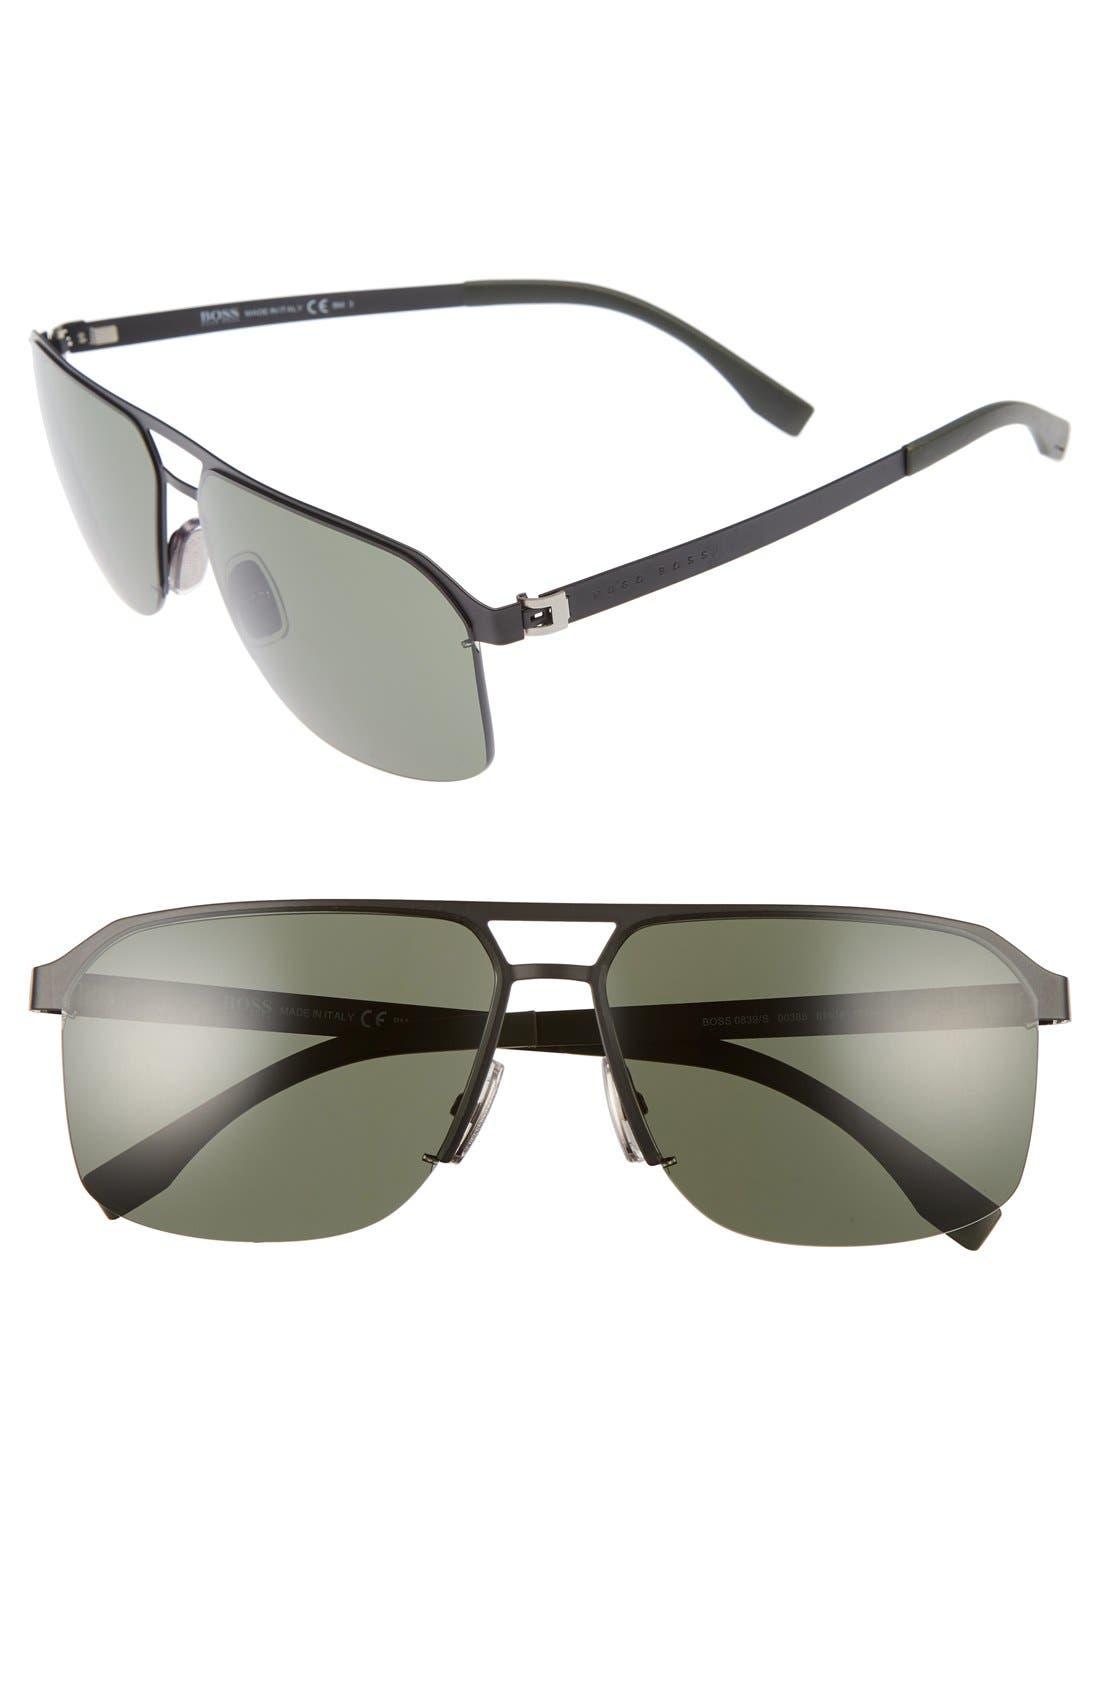 839/S 61mm Sunglasses,                             Main thumbnail 1, color,                             Matte Black